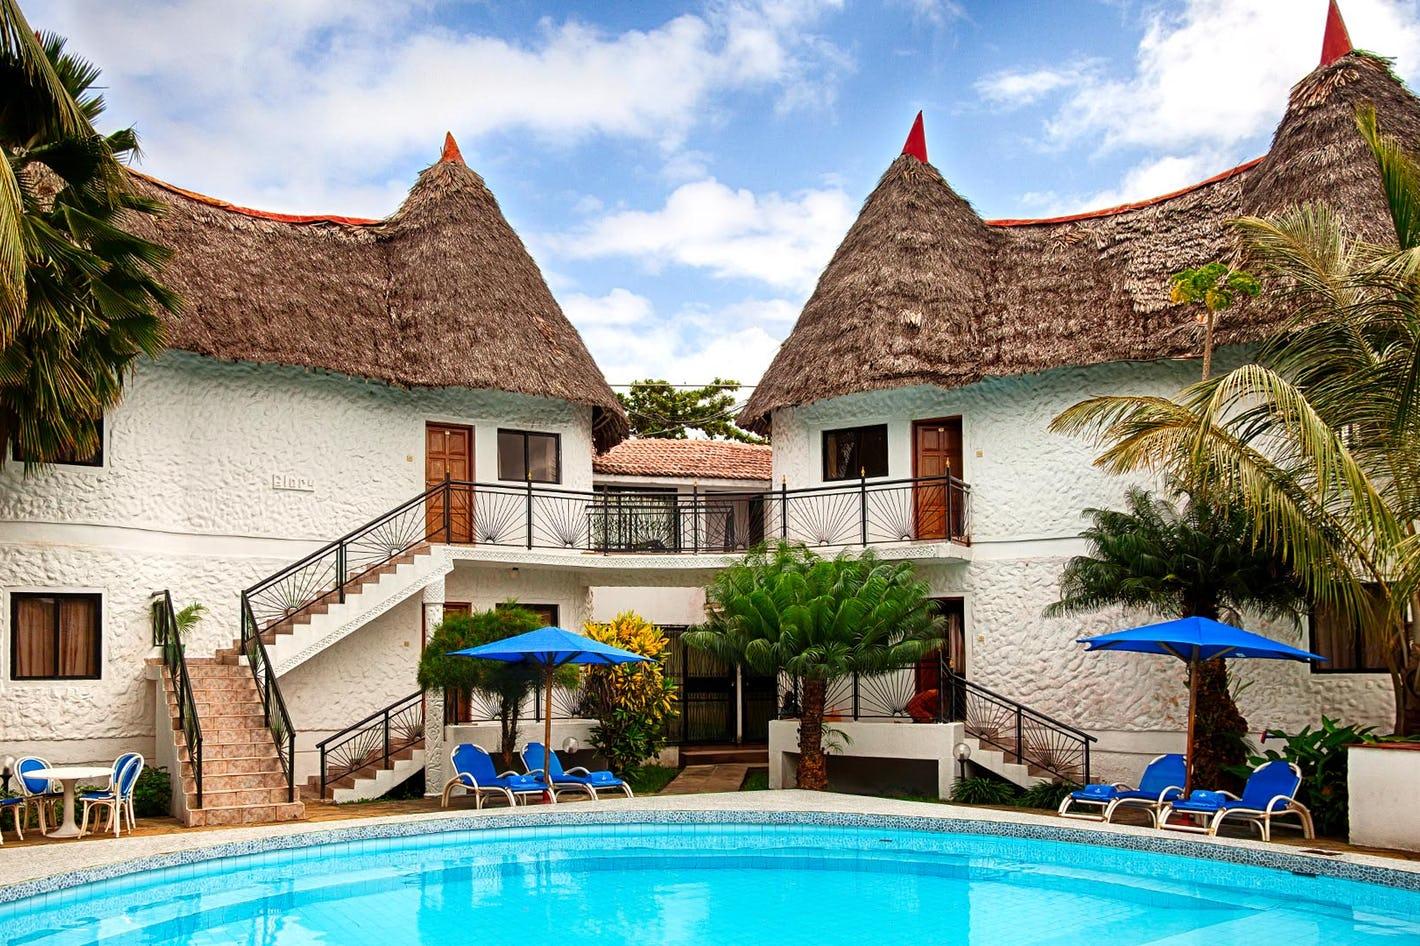 PrideInn Nyali best budget hotels in Mombasa